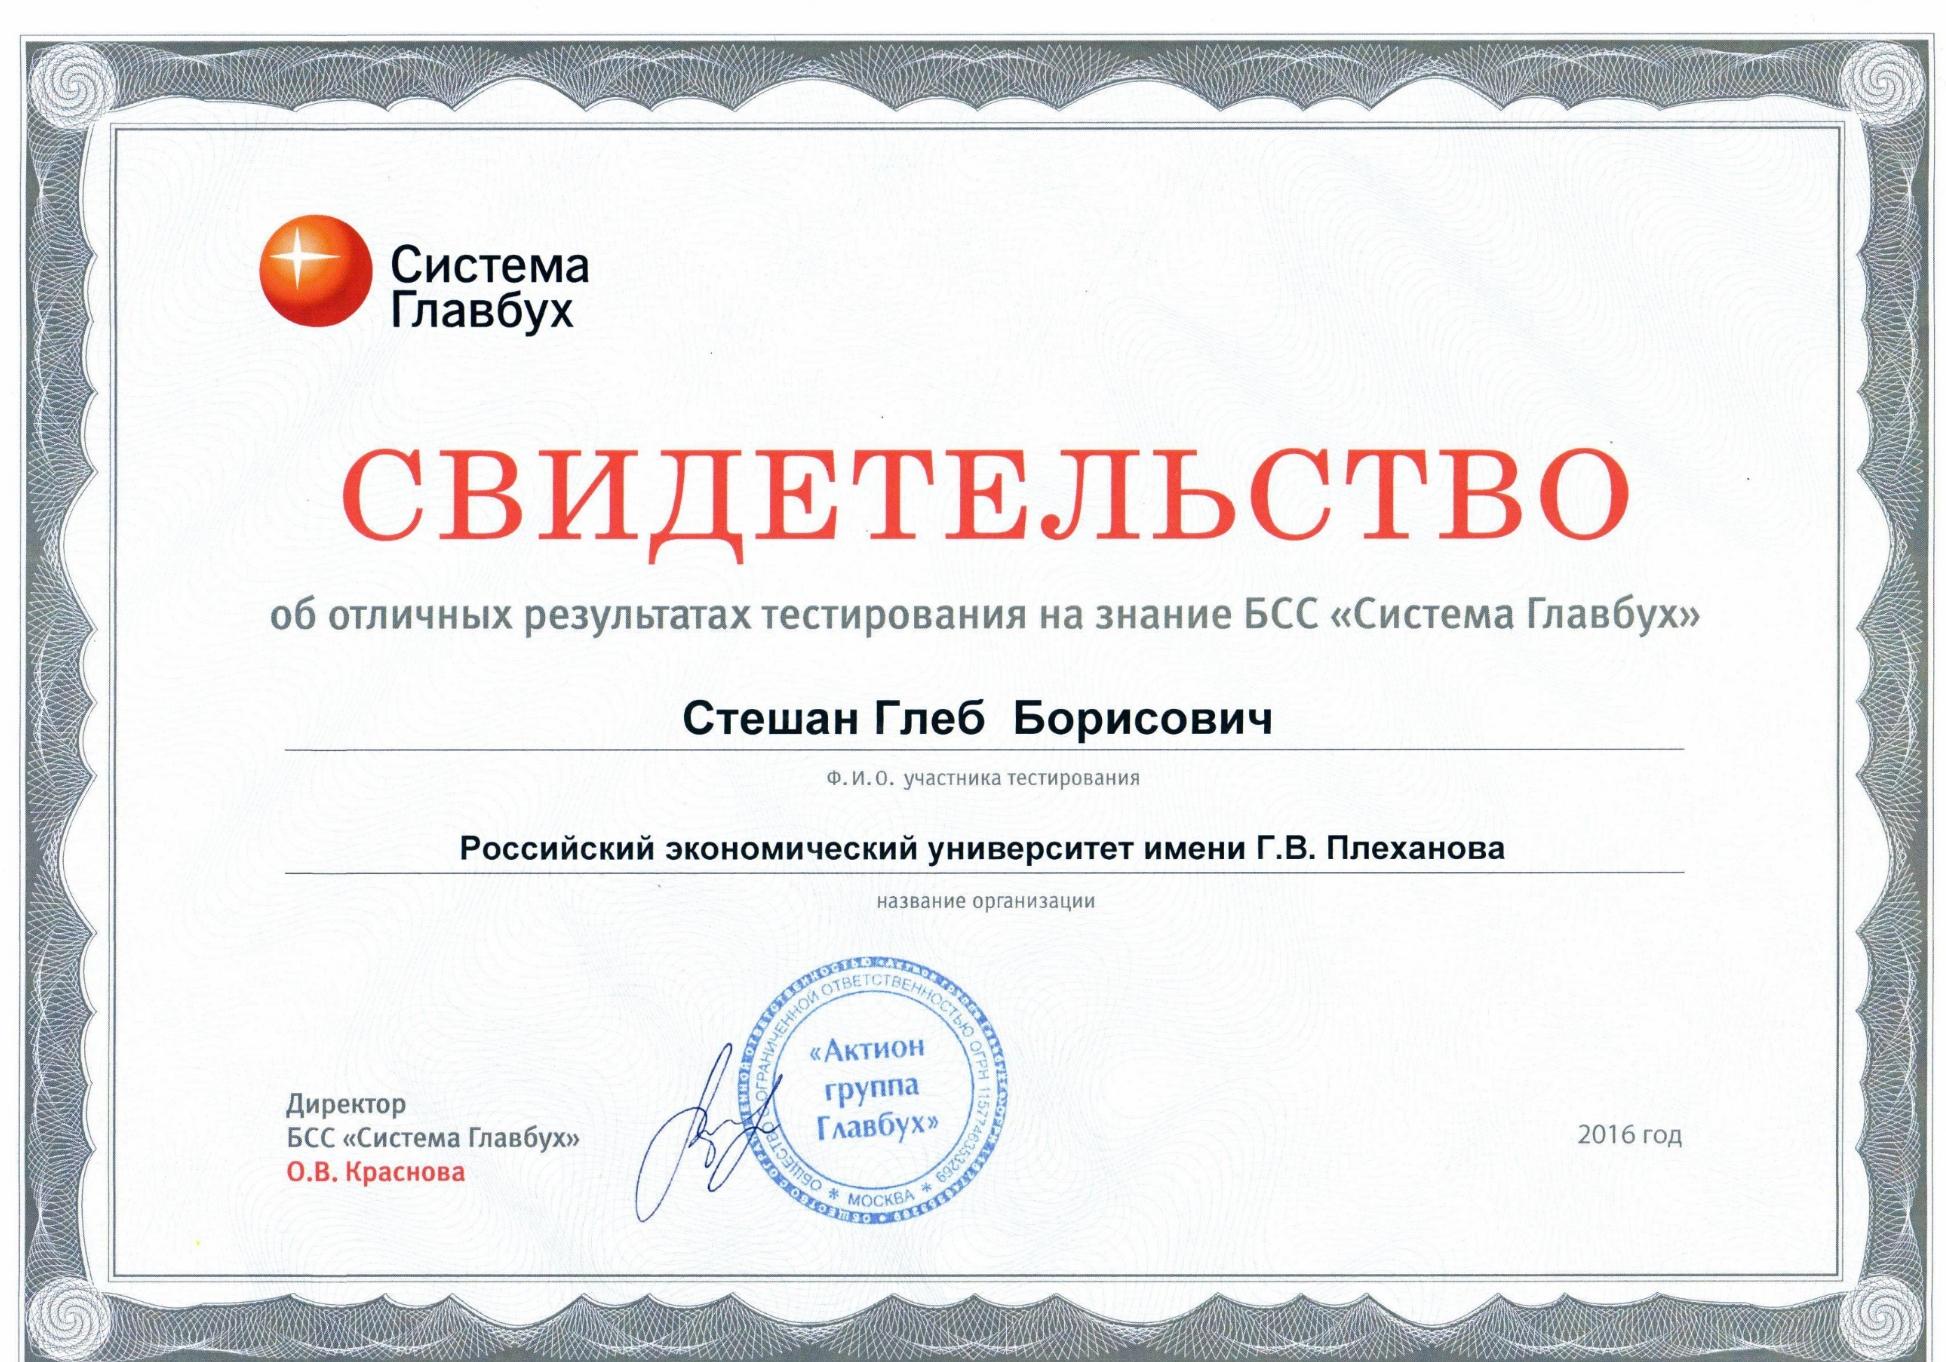 http://www.konsaltingpremium.ru/wp-content/uploads/2018/02/Svidetelstvo-Glavbukh.jpg